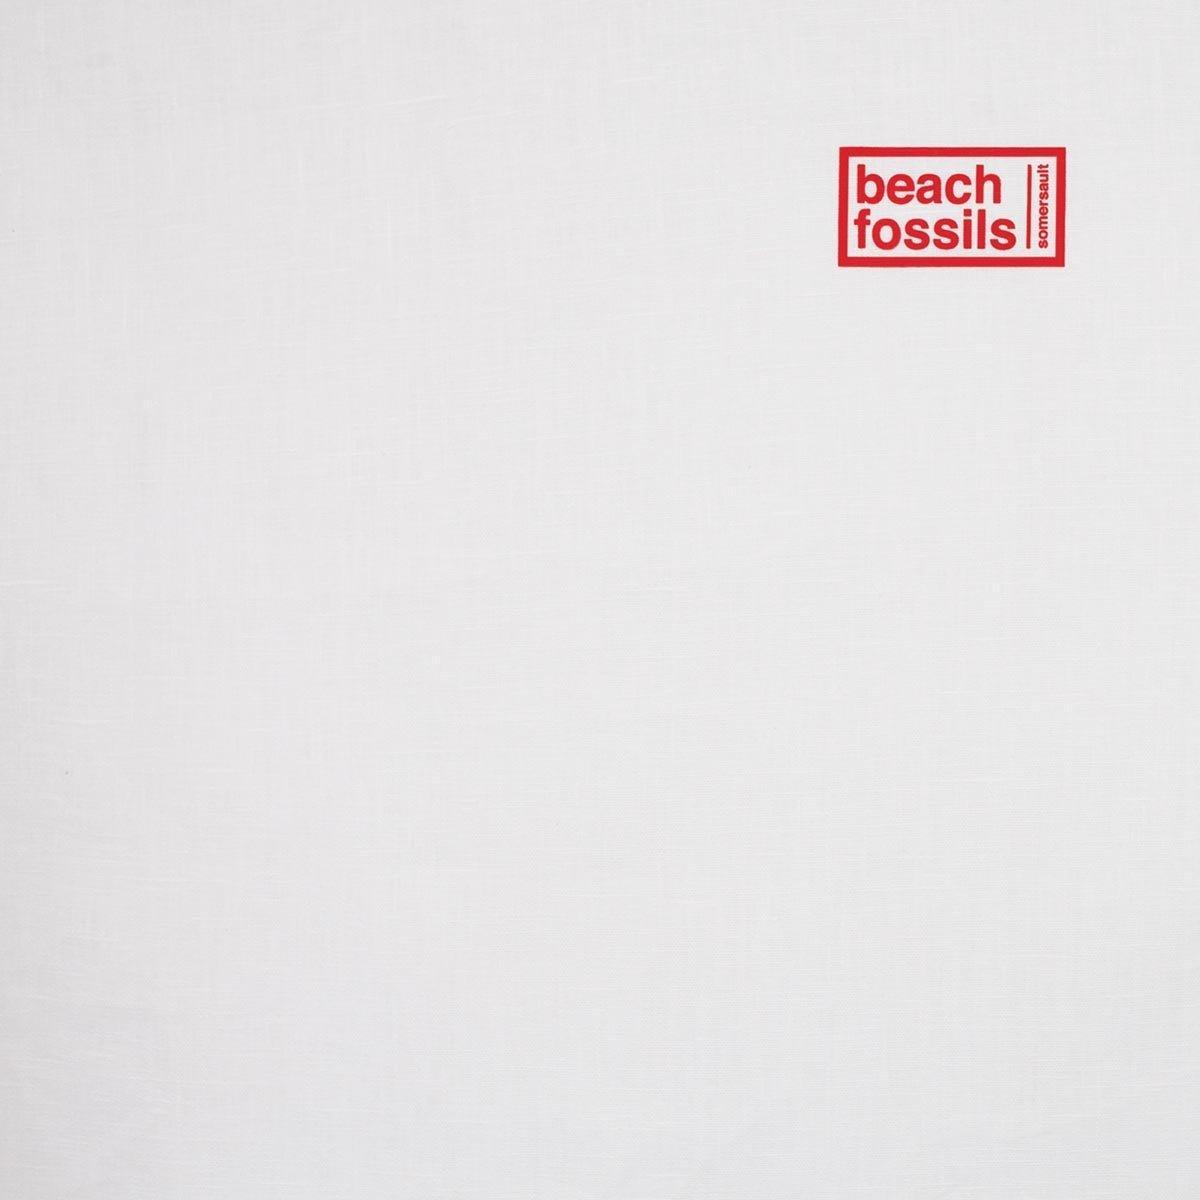 Beach Fossils: Somersault [Album Review]